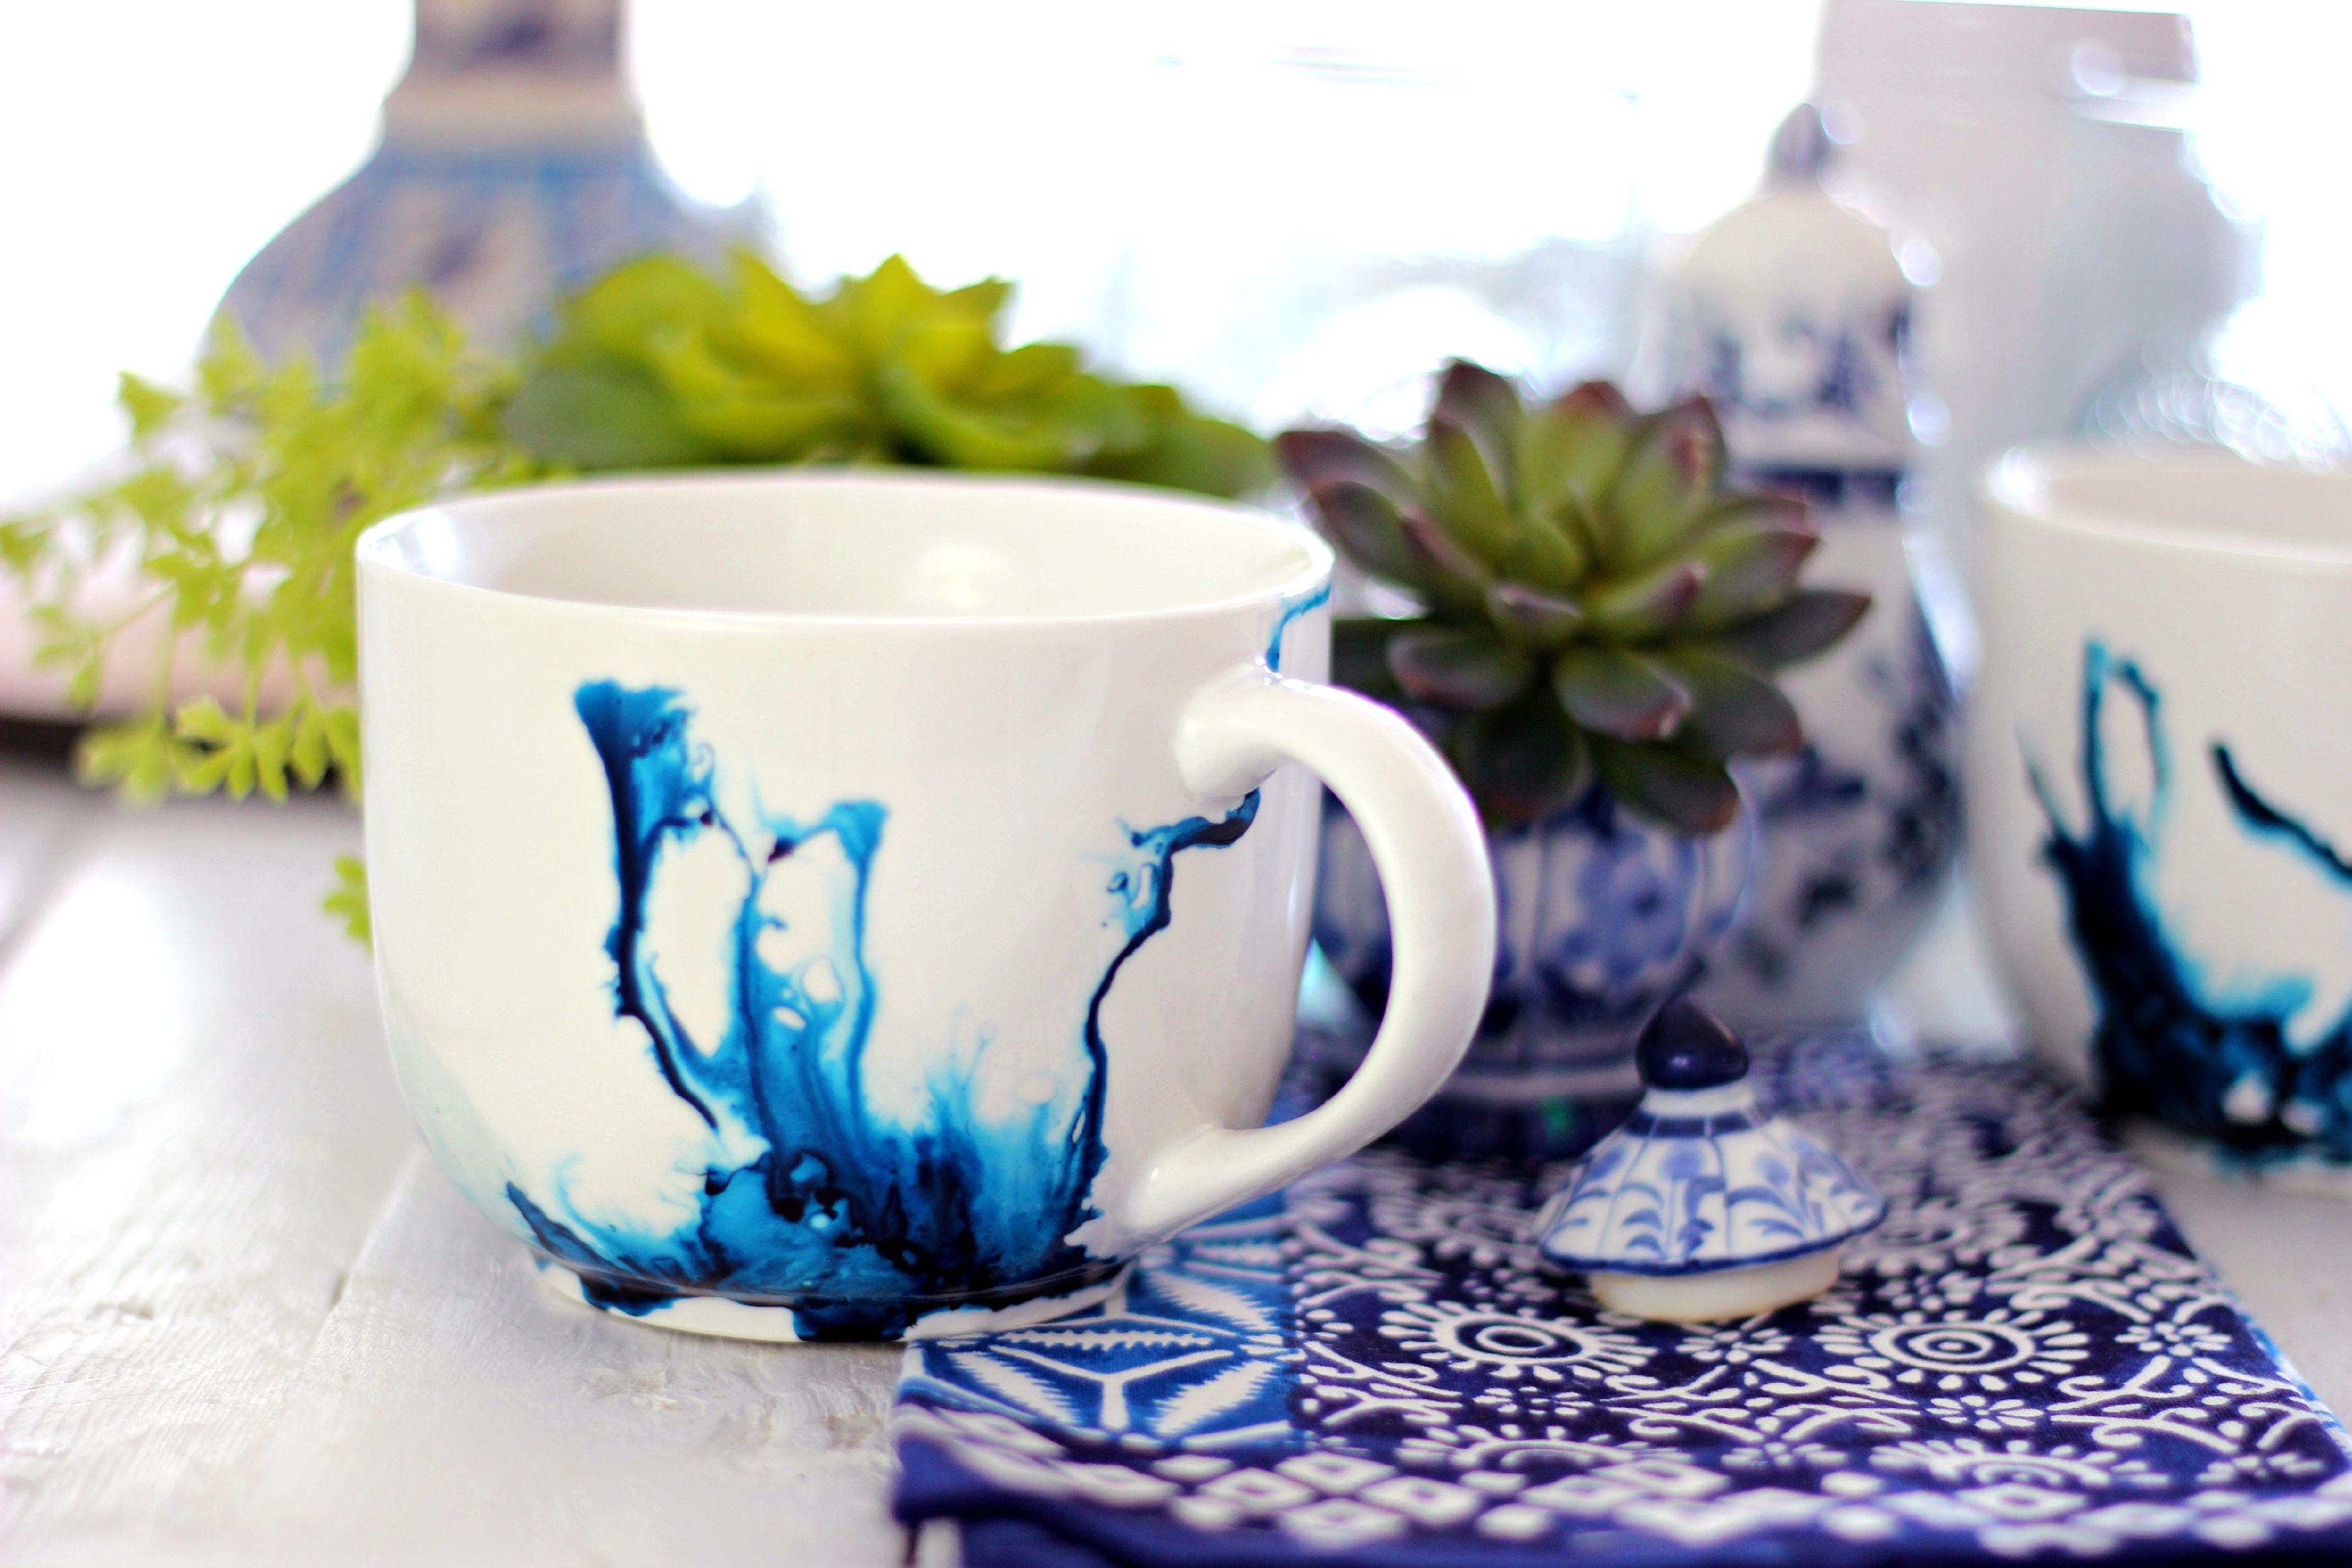 Double An Ceramic Coffee Mugs Watercolor Mugs Using Alcohol Ink furniture Beautiful Ceramic Mugs